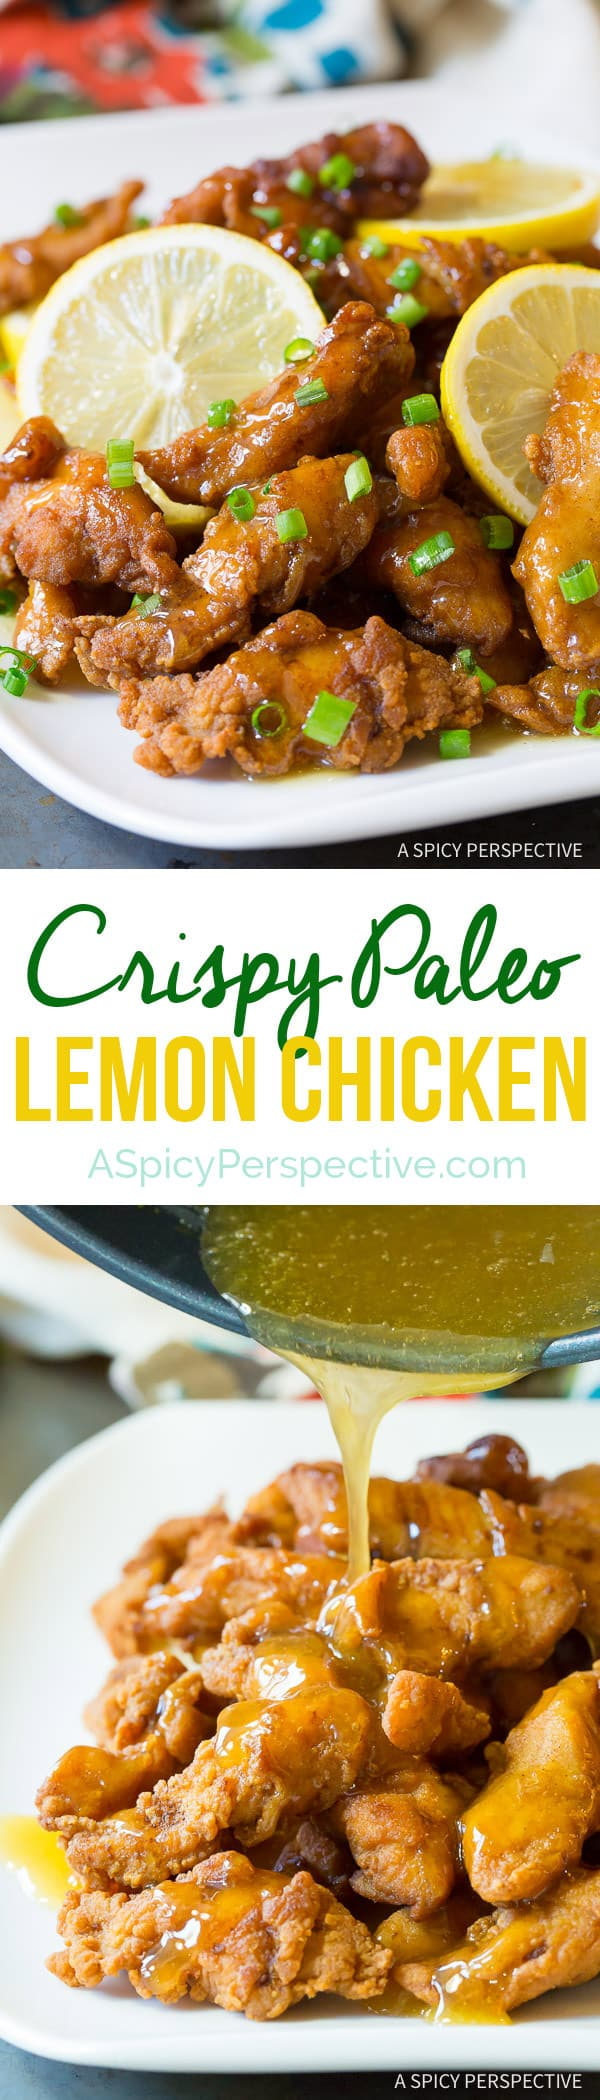 Crazy over this Lightened-Up Chinese Lemon Chicken Recipe (Paleo & Gluten Free!) | ASpicyPerspective.com